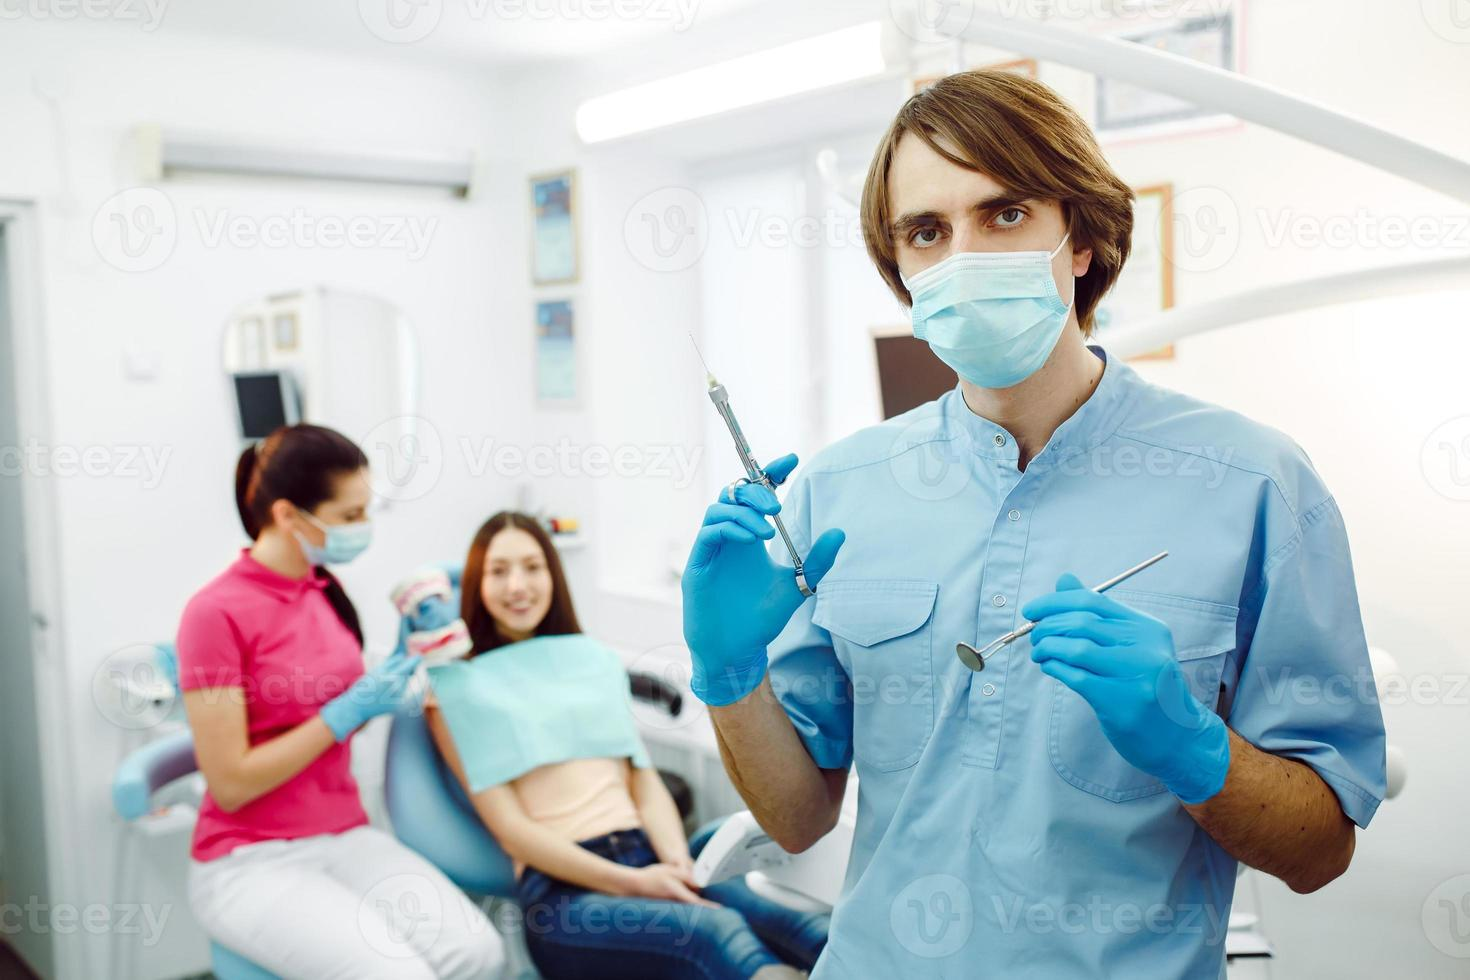 anestesia dental sobre un fondo del paciente foto